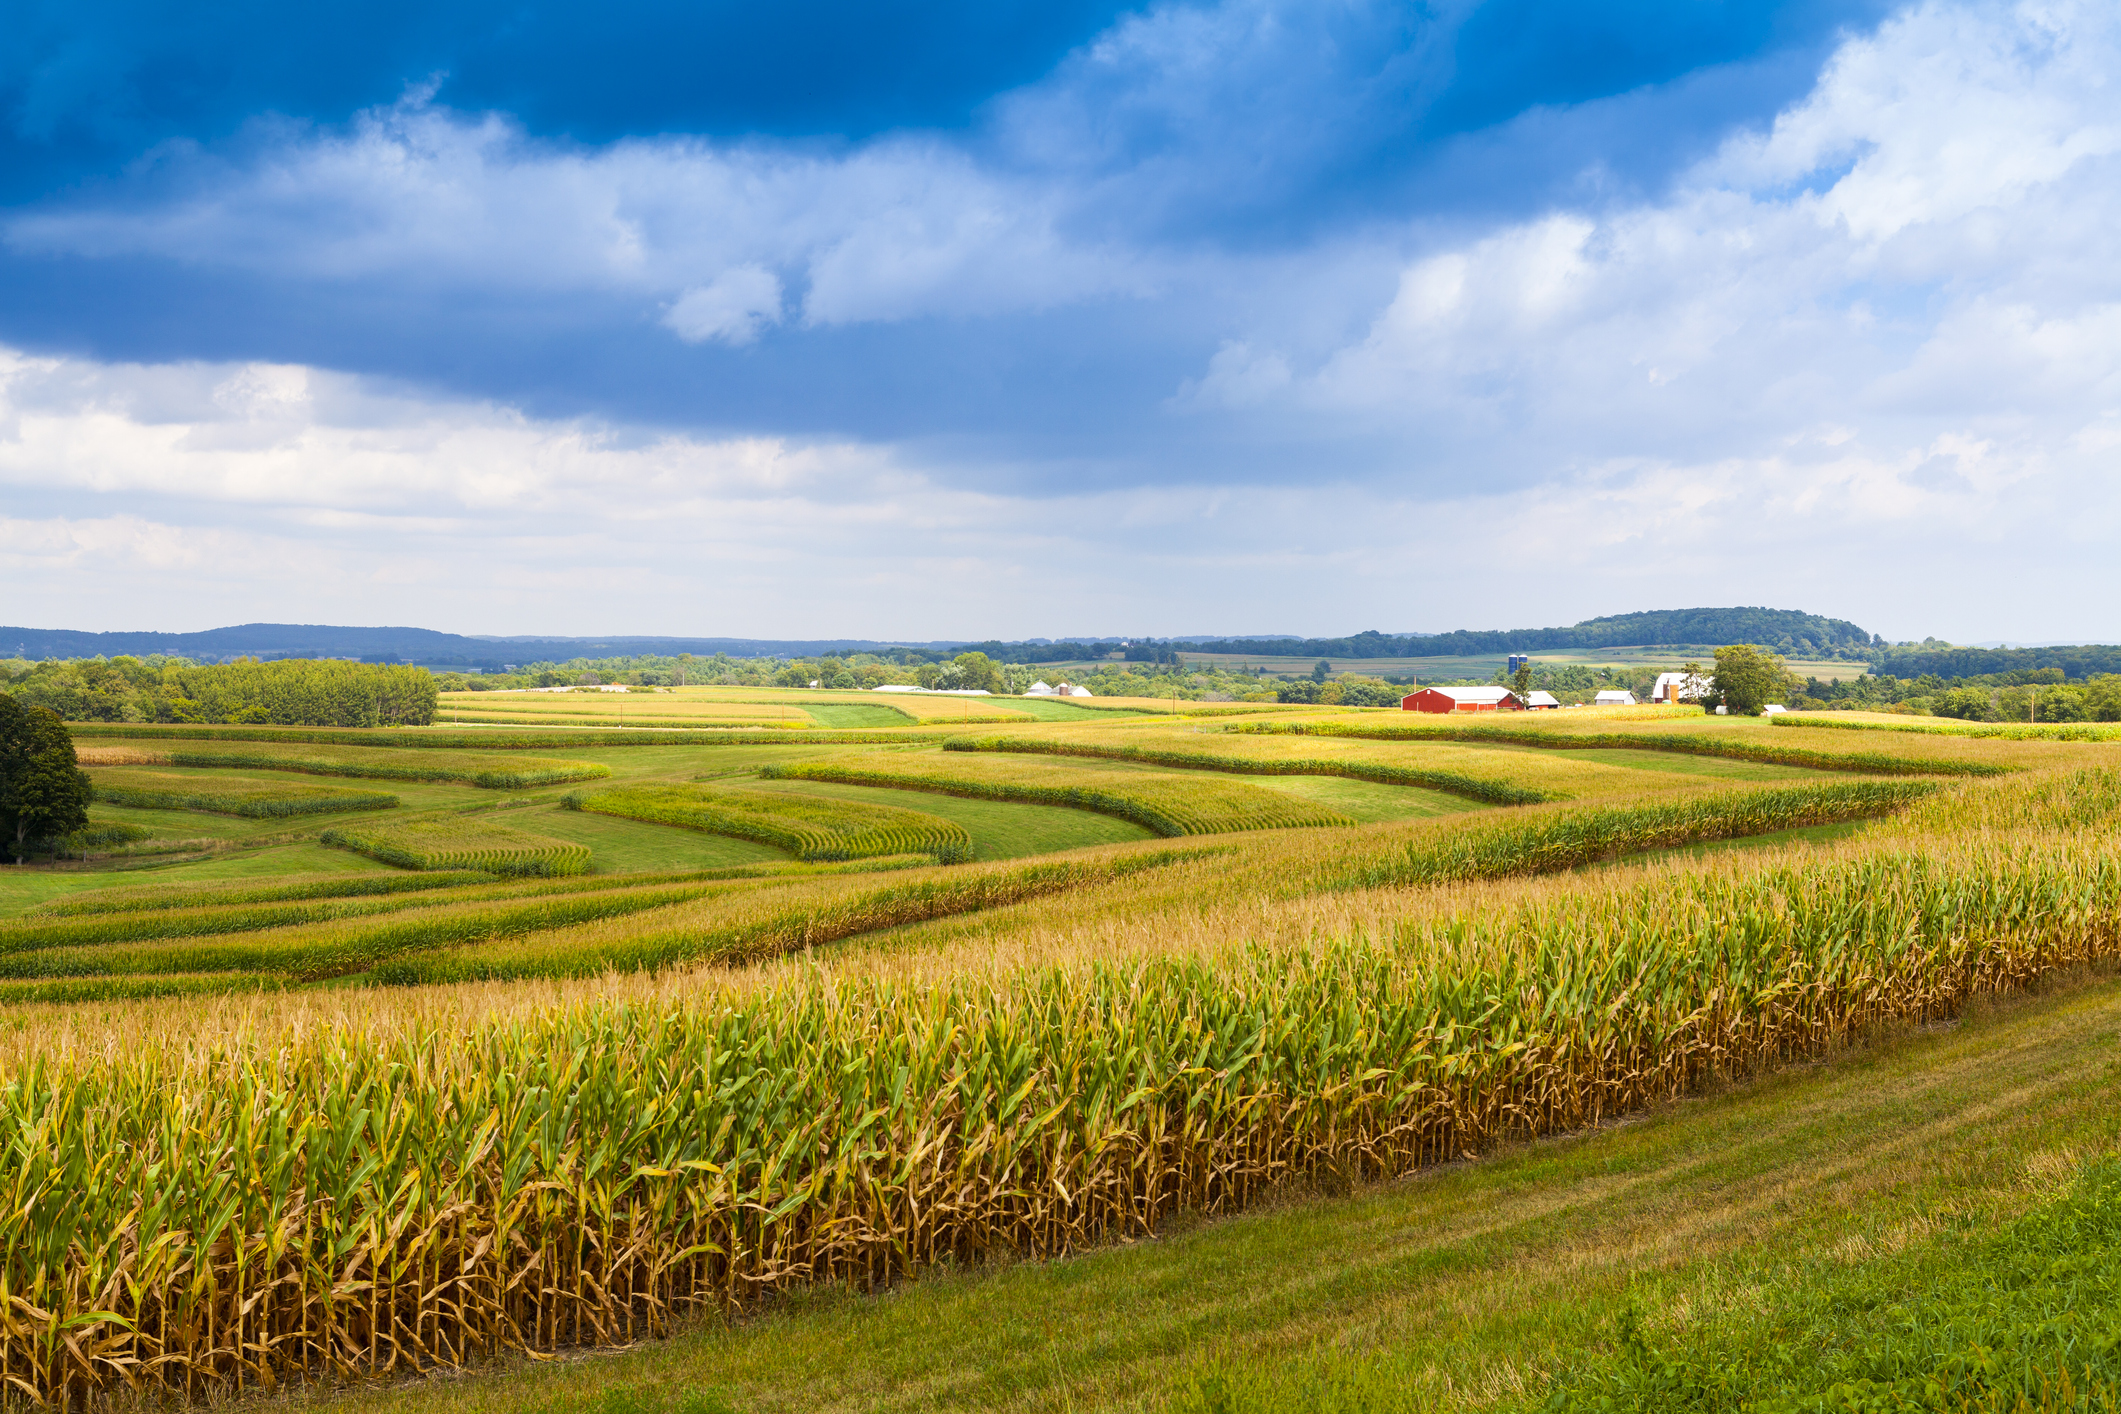 Fintech Takes Root in America's Farmland - CFO